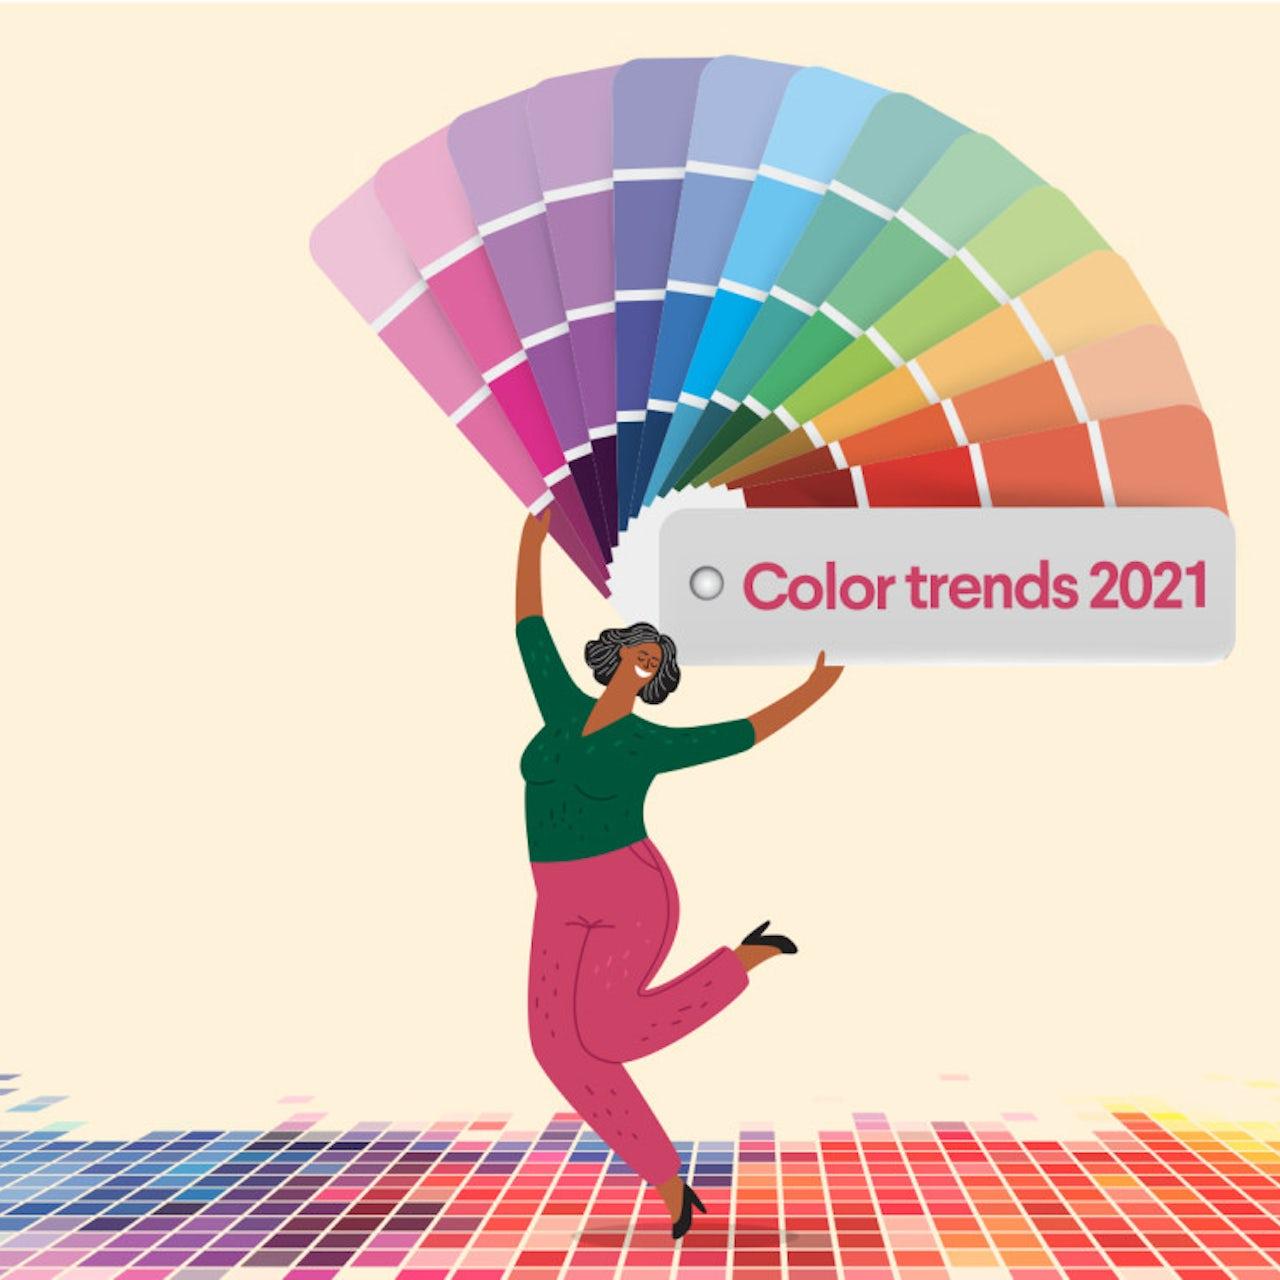 9 Brilliant Color Trends For 2021 99designs